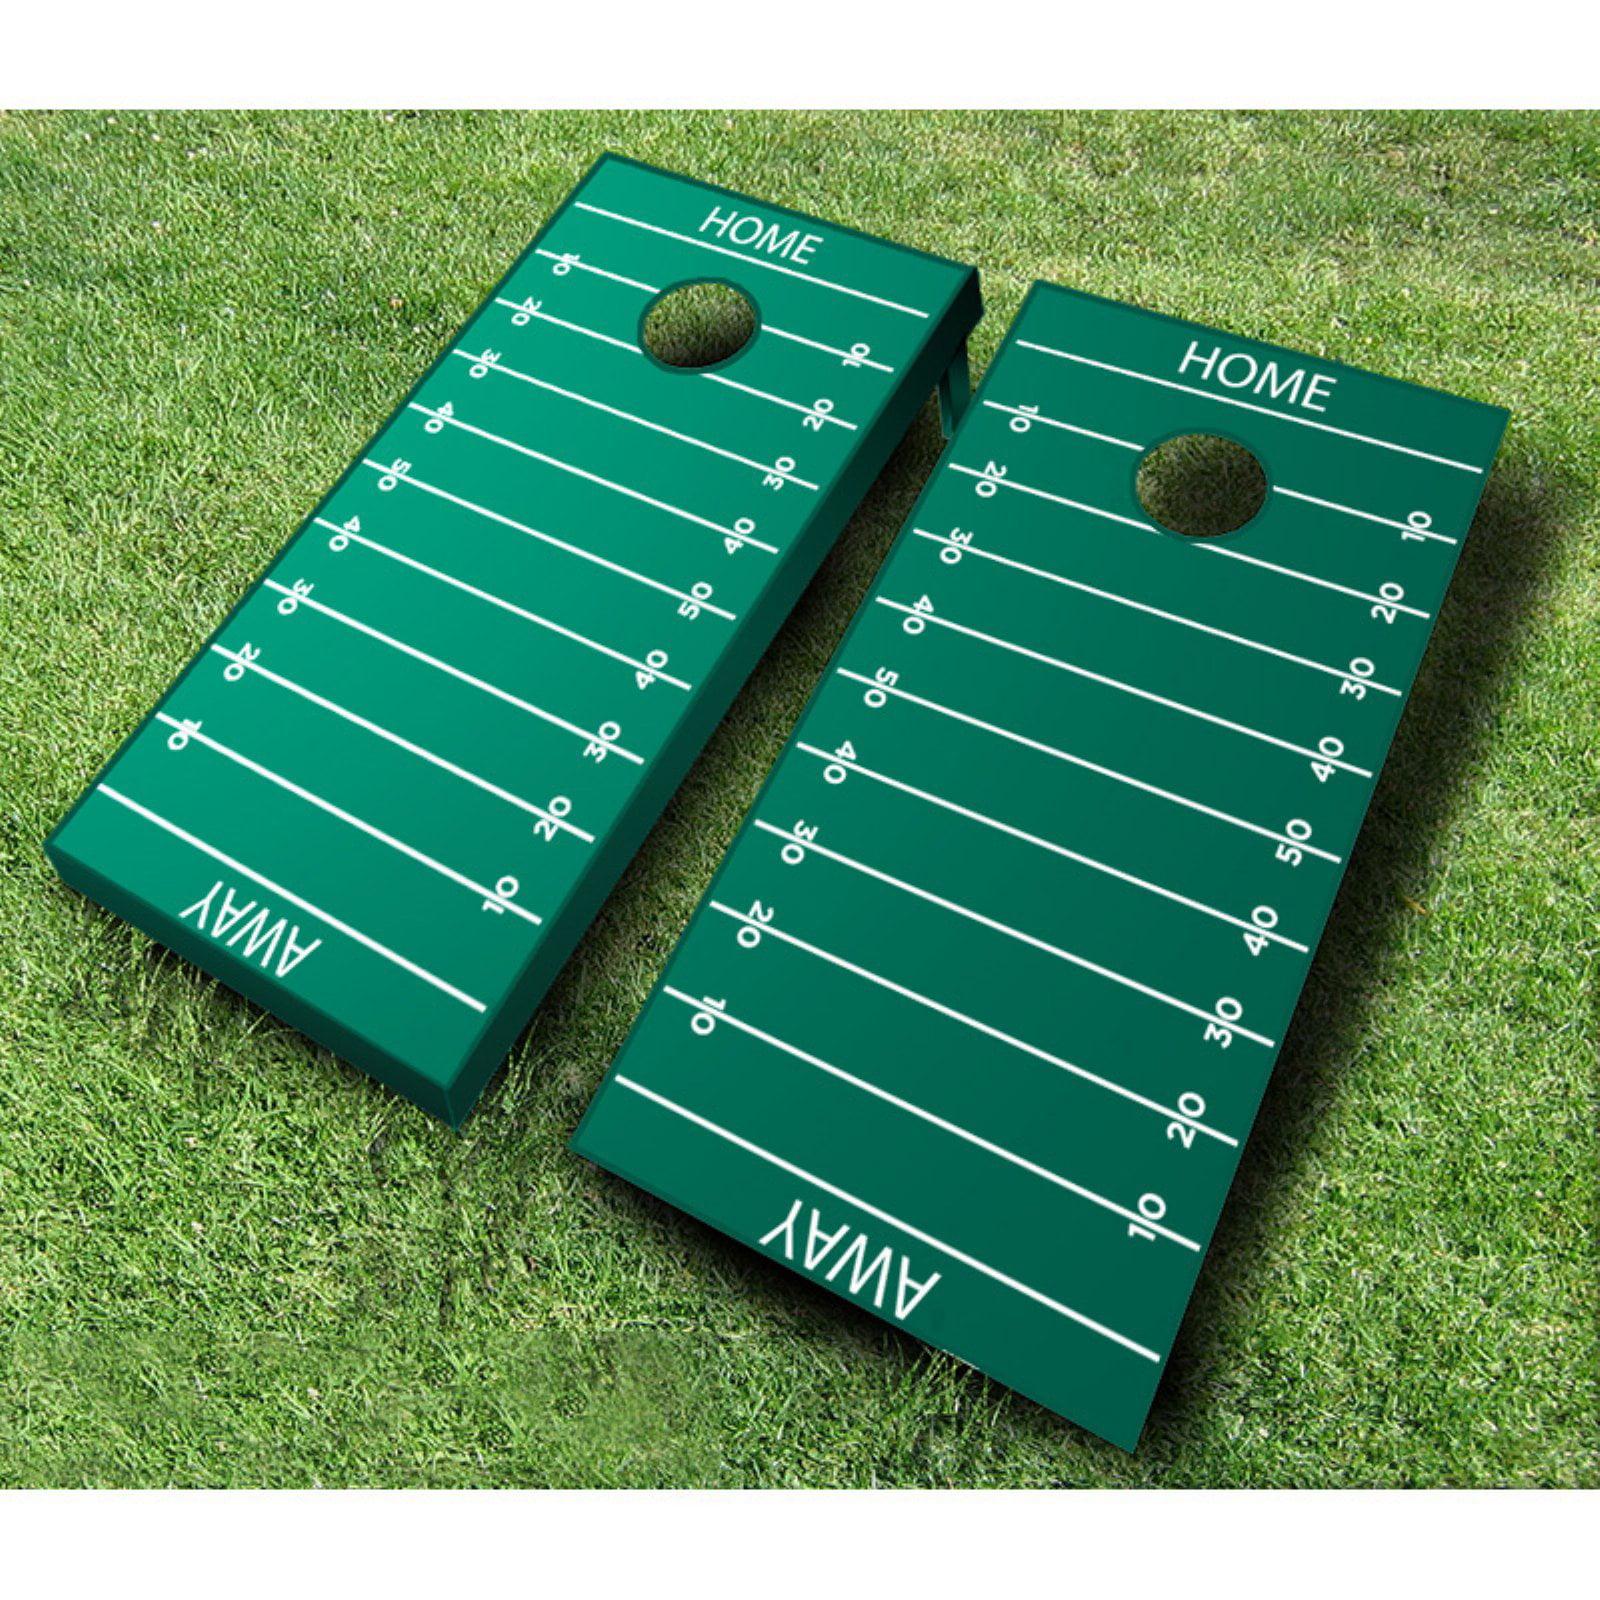 Football Field Tournament Cornhole Set